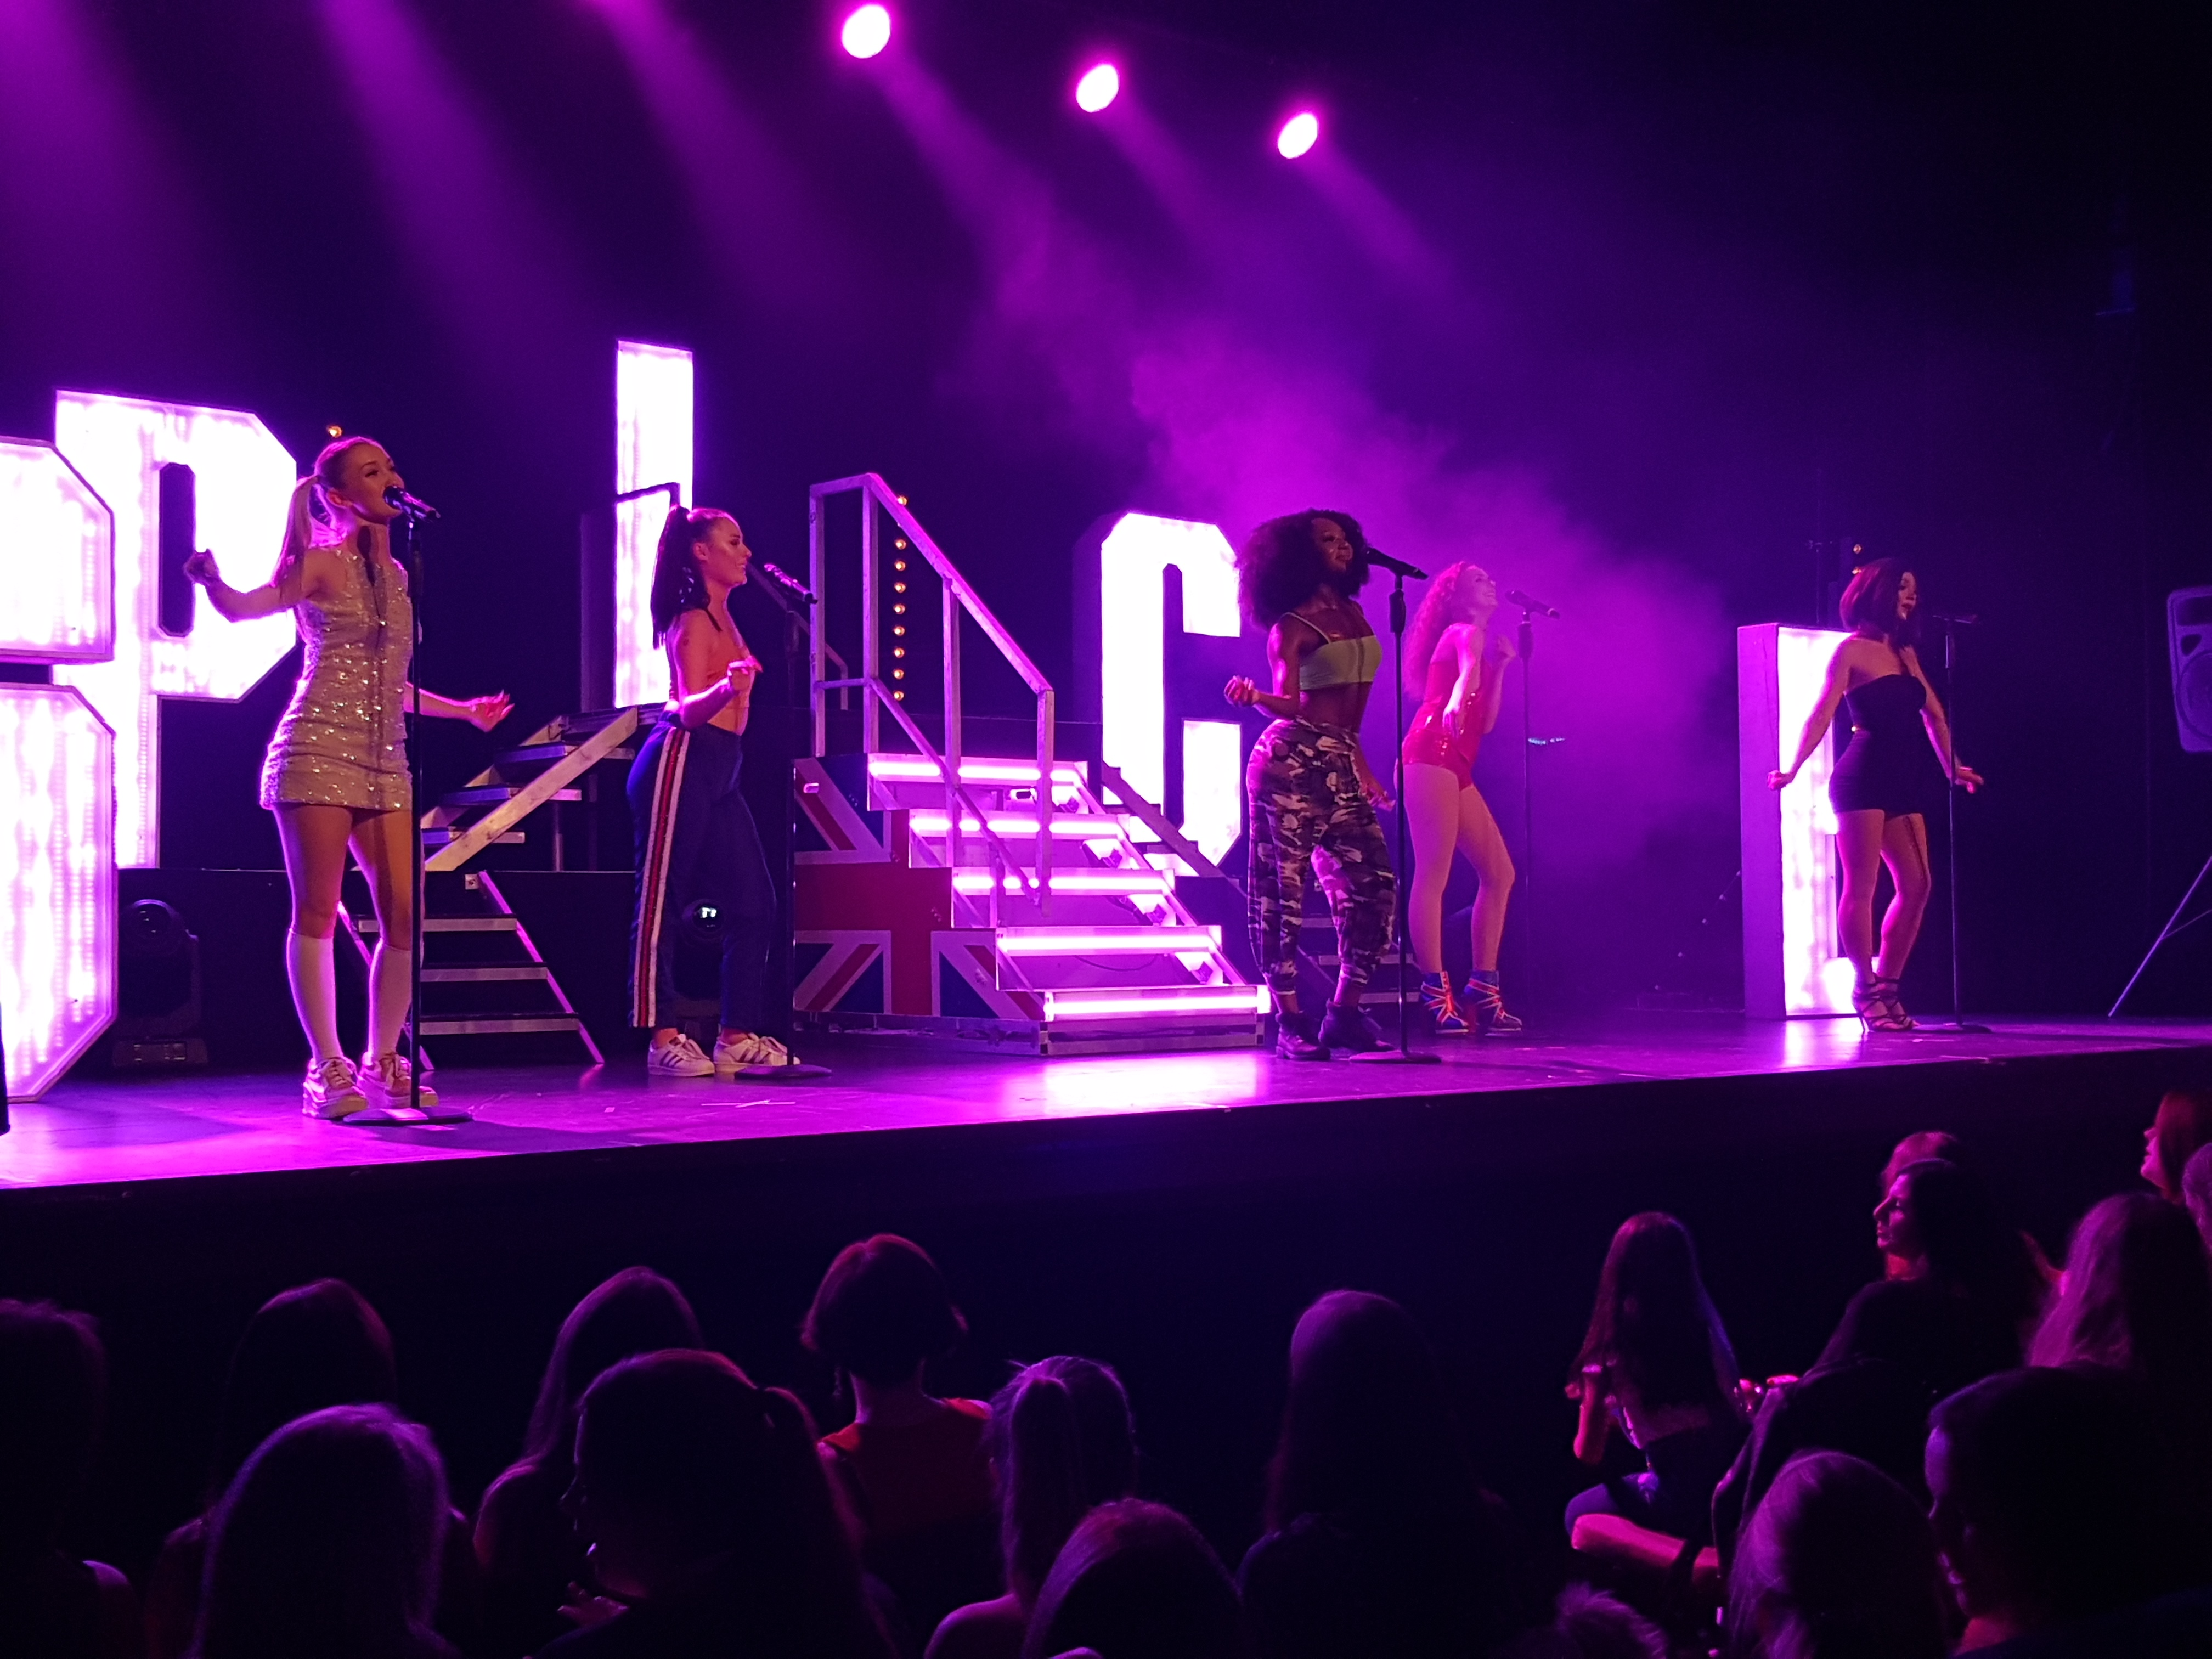 Spice girls 20.10.18